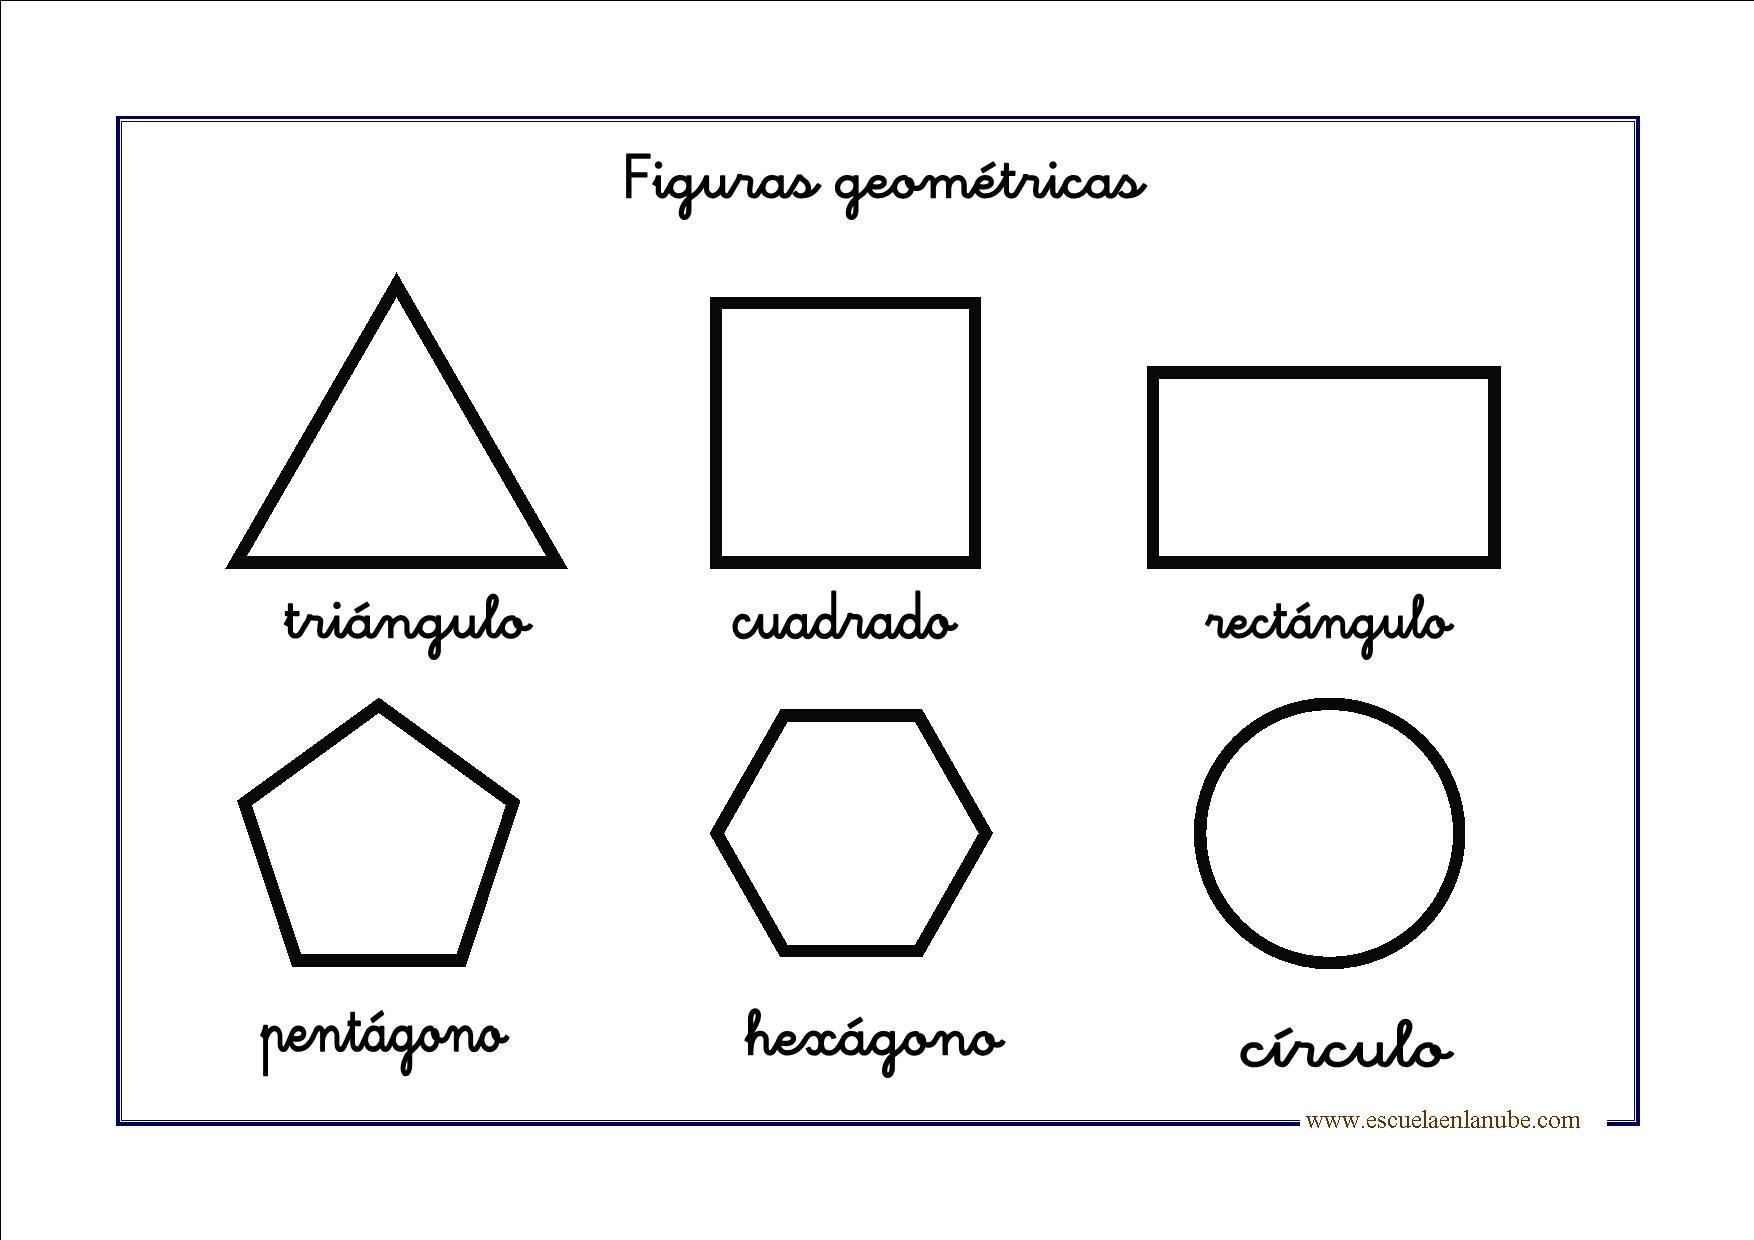 figuras geom tricas para infantil y primaria